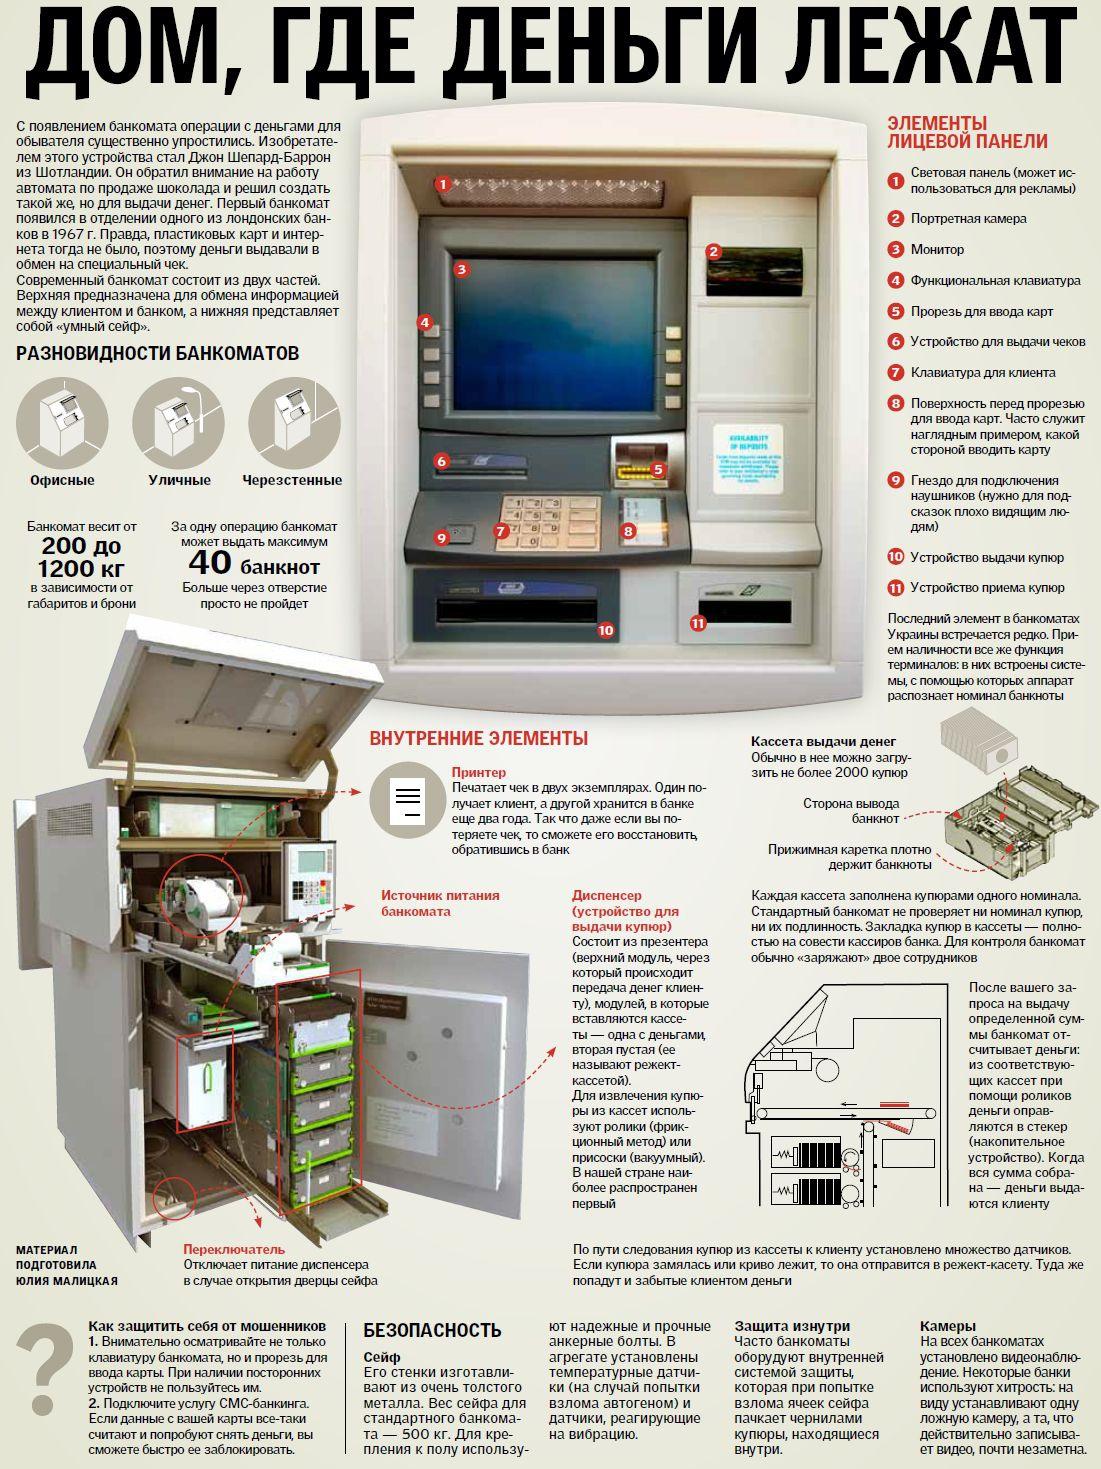 Банкомат схема